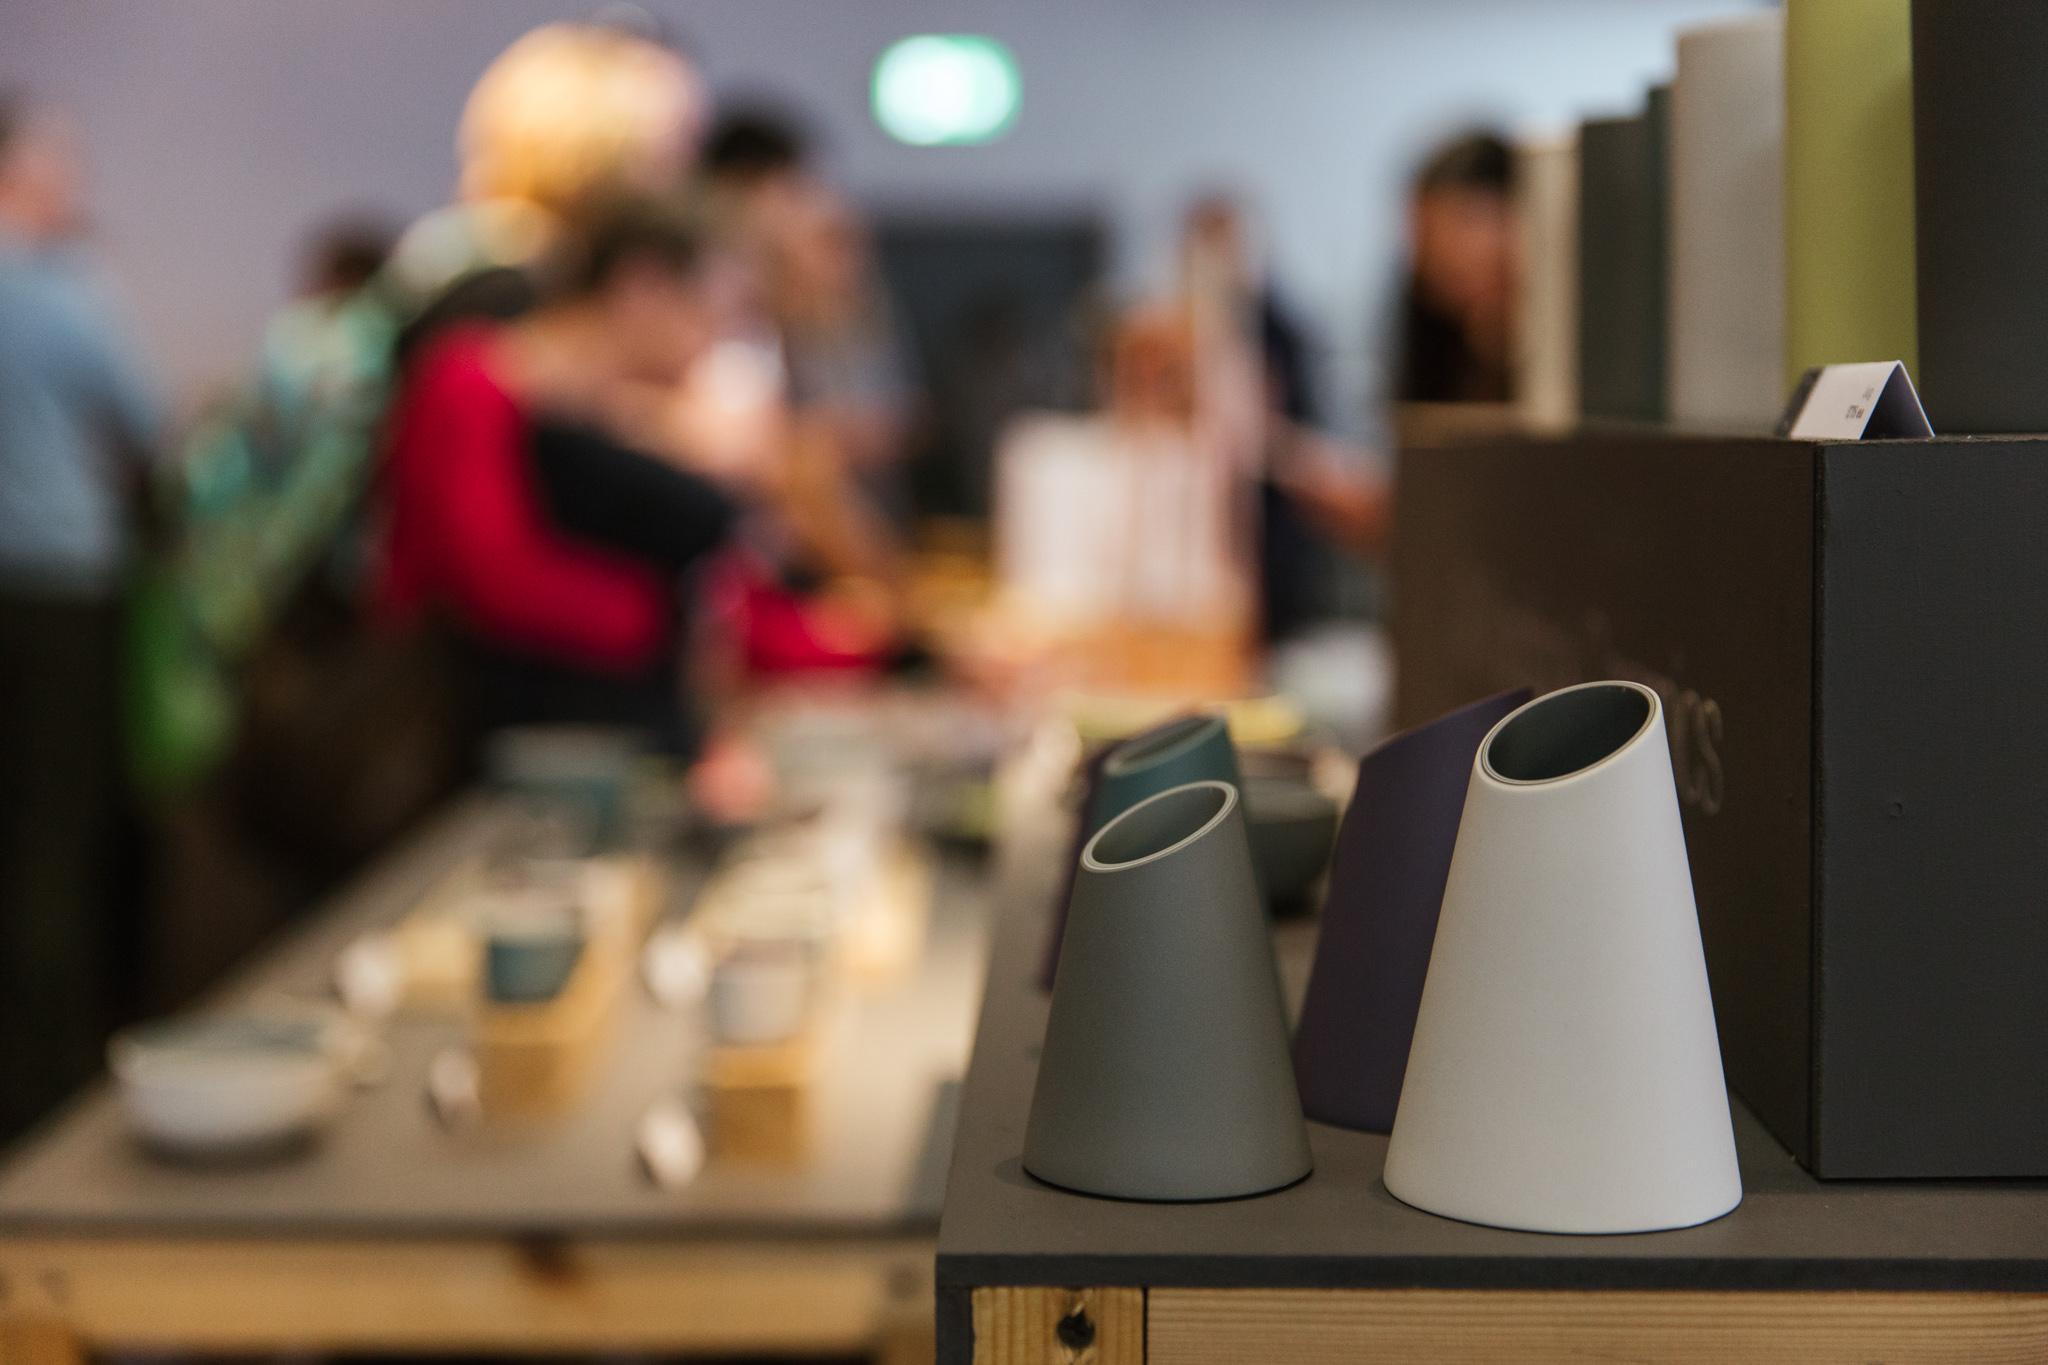 Hepworth-CeramicsFair-Joanne_Crawford-4256.JPG